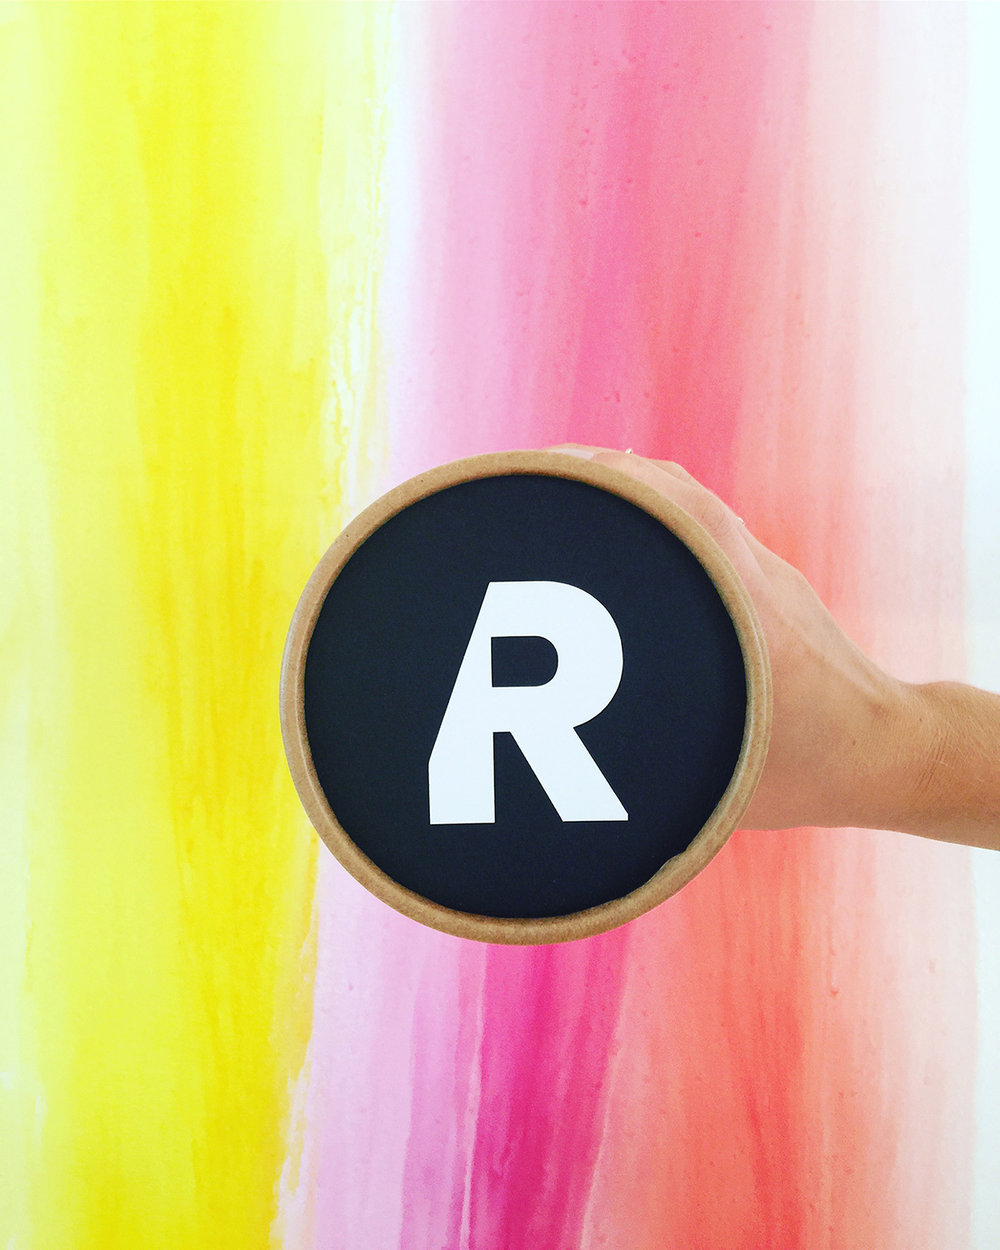 Rollout_SampleKit-Palmerston1.jpg